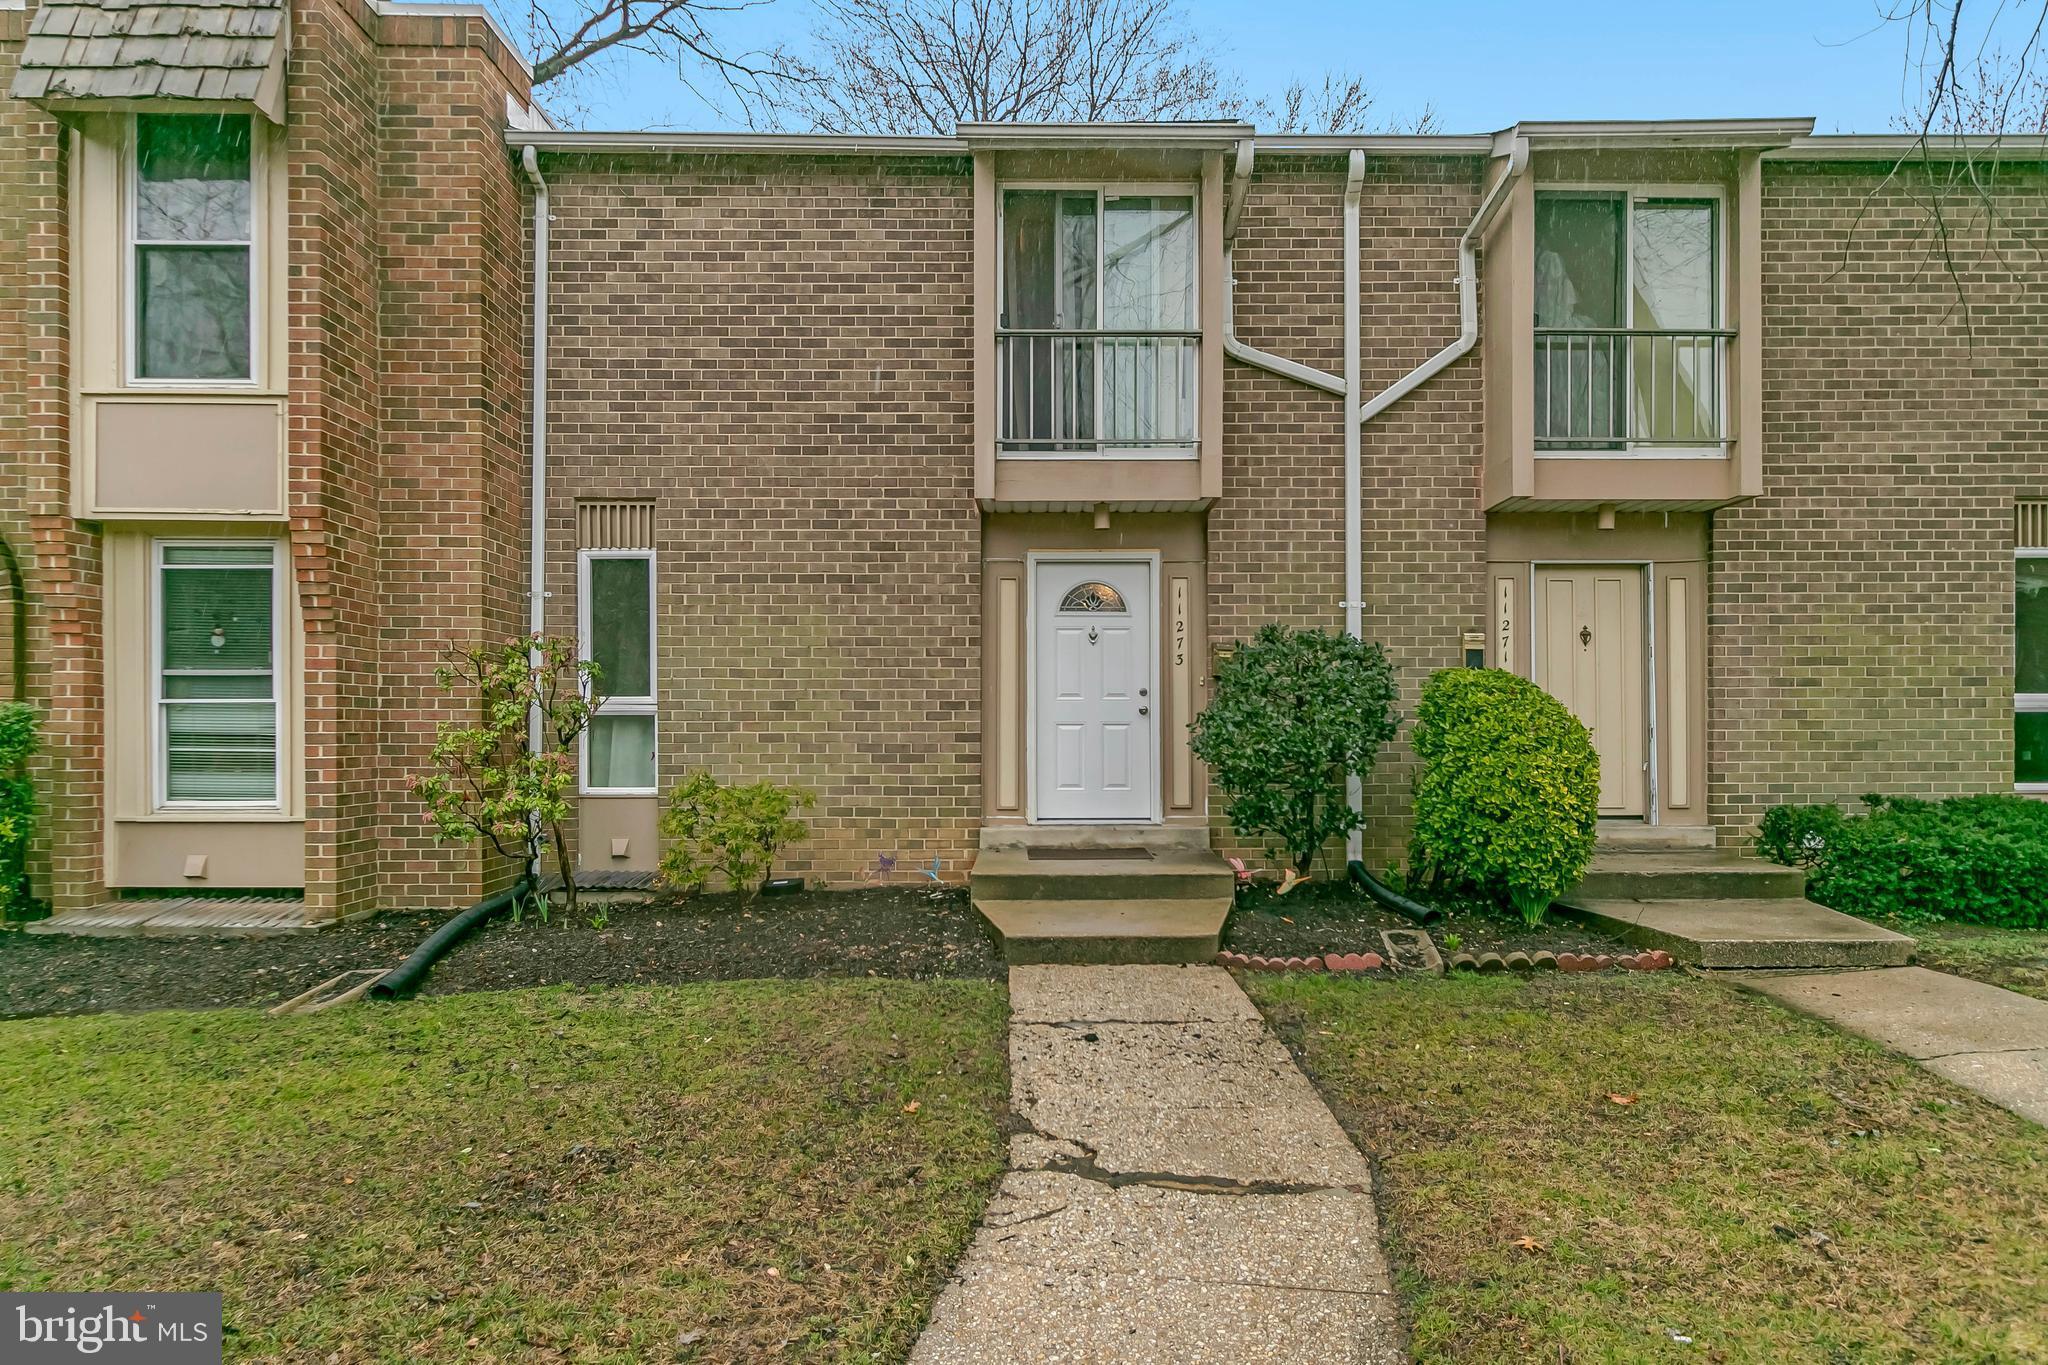 11273 COLUMBIA PIKE, SILVER SPRING, Maryland 20901, 3 Bedrooms Bedrooms, ,3 BathroomsBathrooms,Condominium,For Sale,11273 COLUMBIA PIKE,MDMC749790